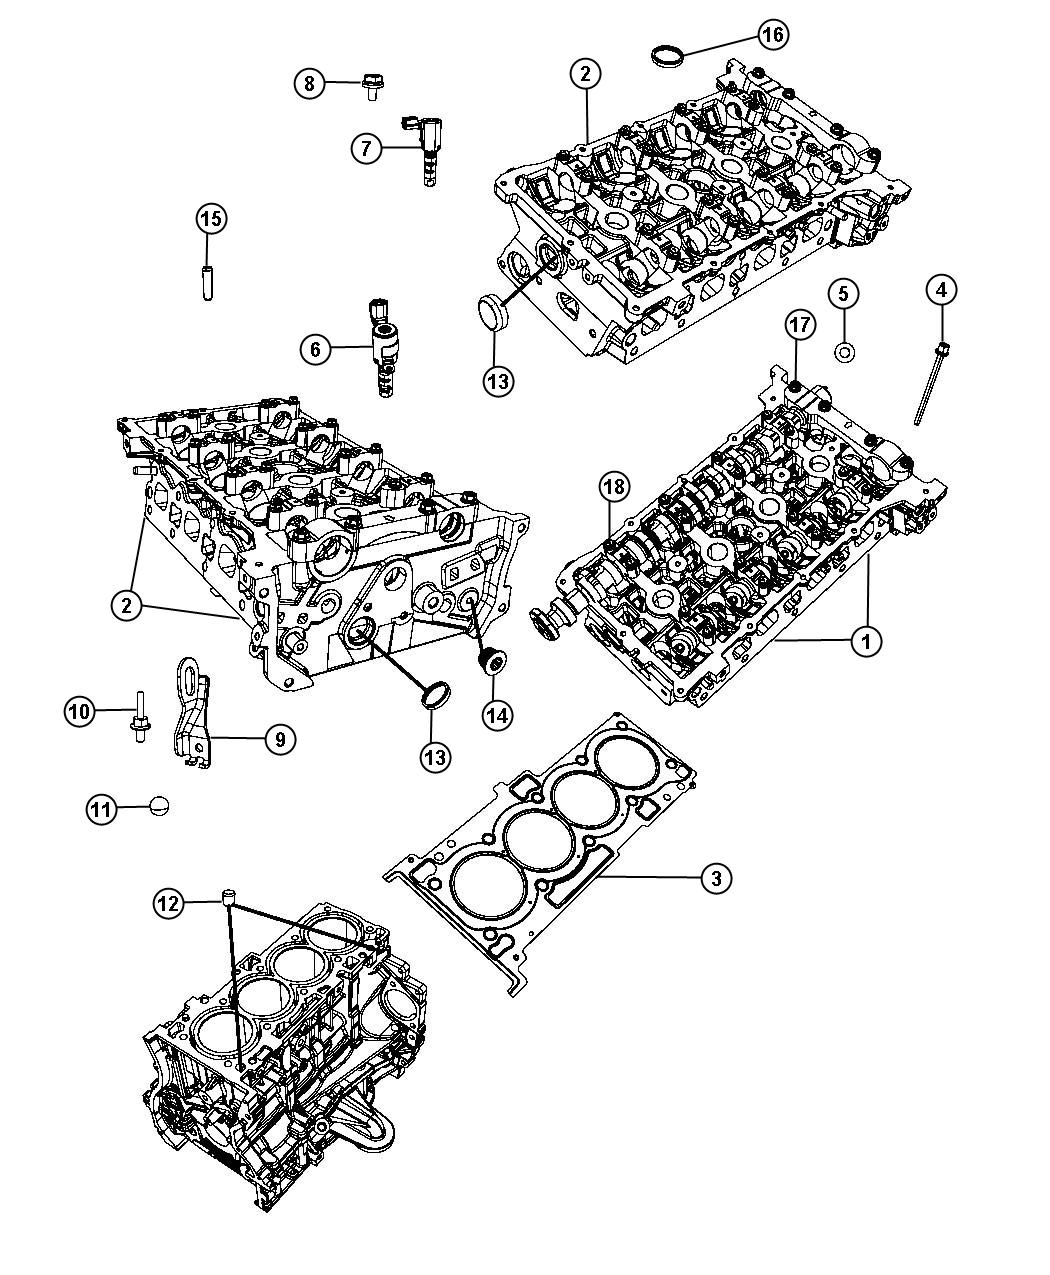 2012 Dodge Avenger Cylinder Head 2.4L [EDG]